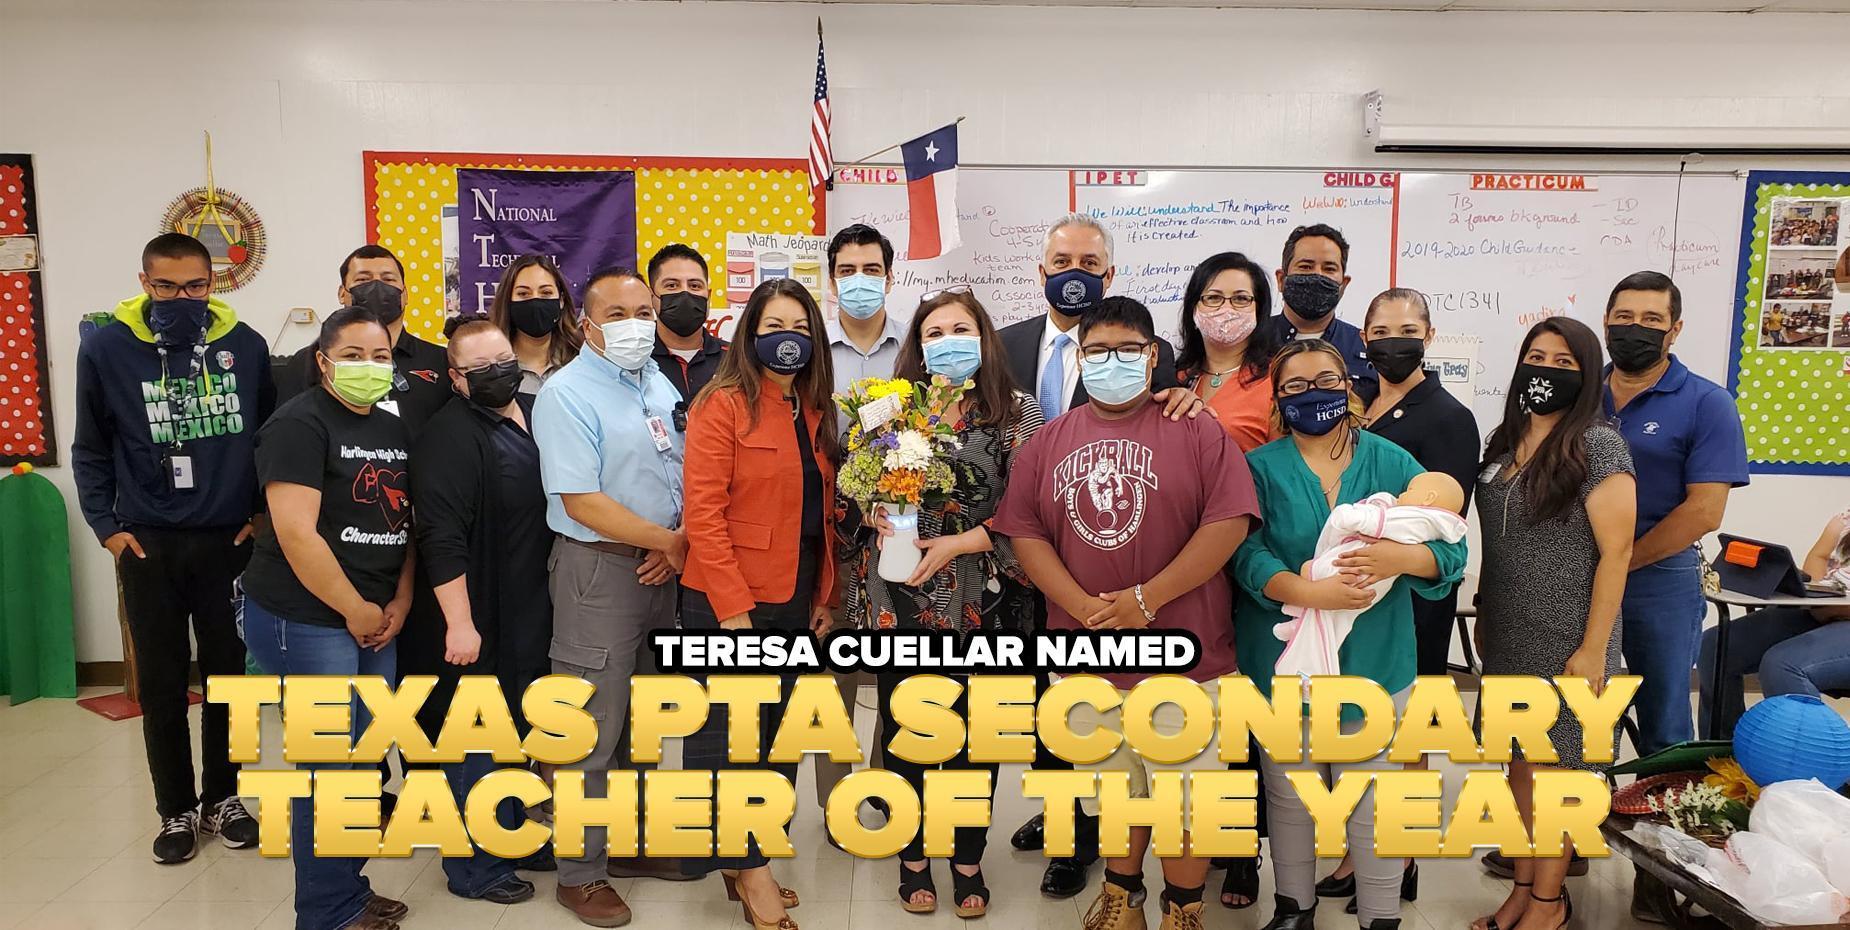 Teresa Cuellar named Texas PTA Secondary Teacher of the Year